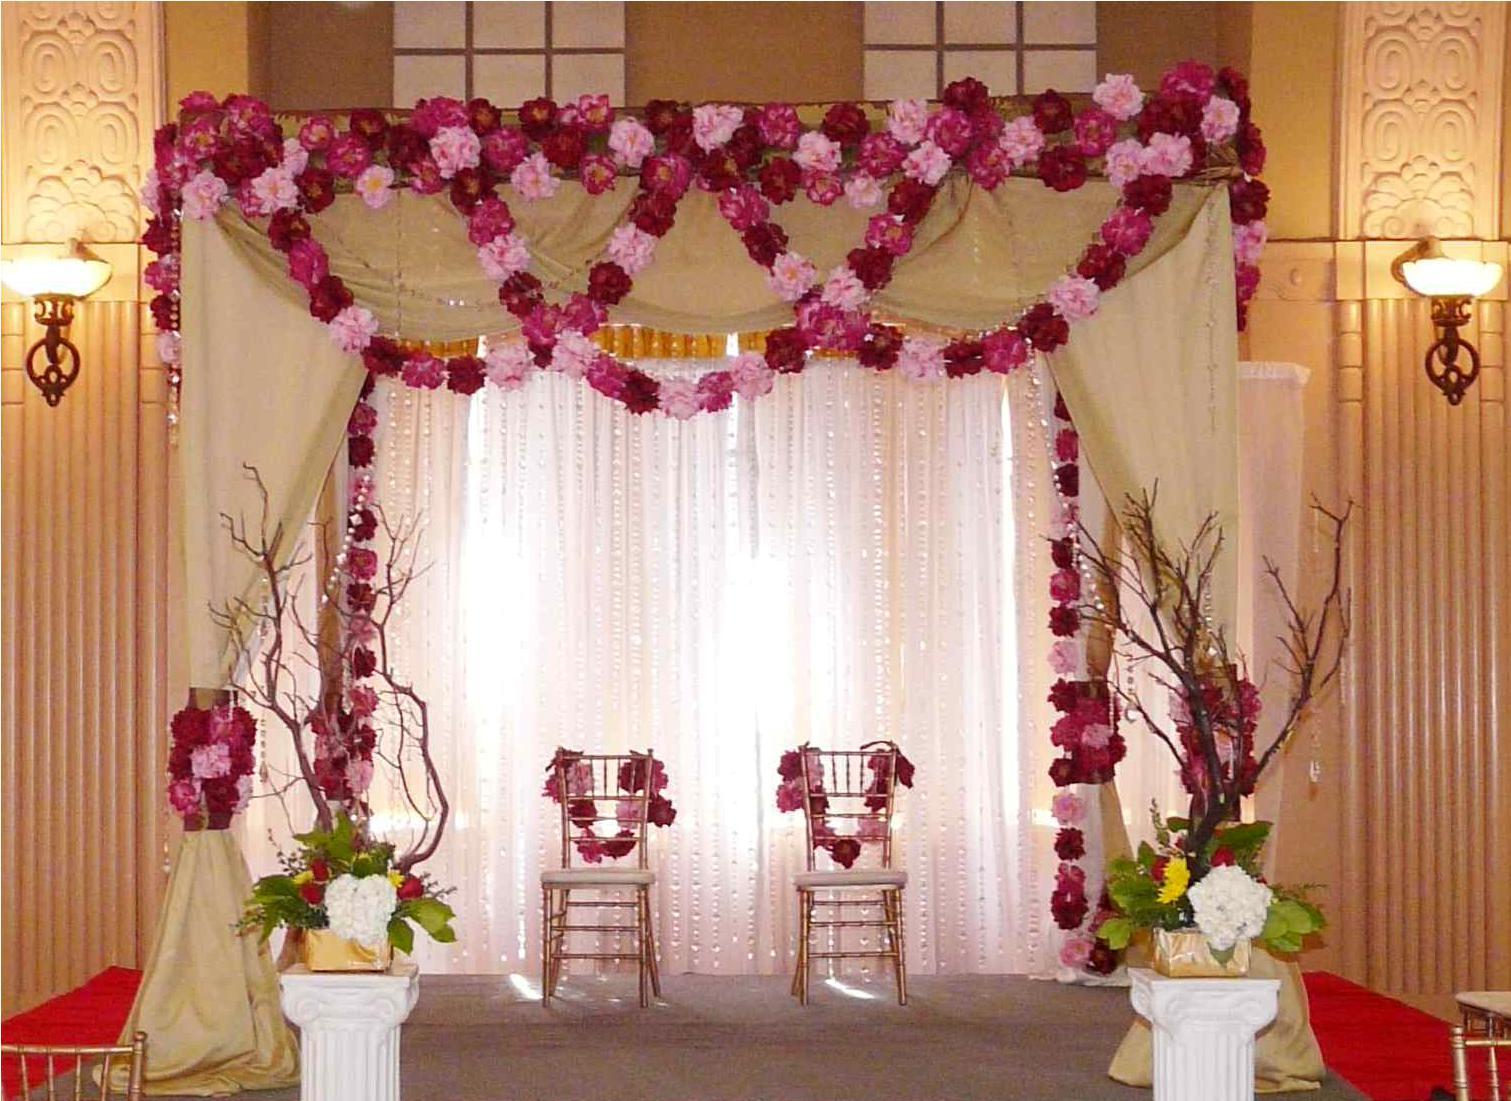 kamlesh & nisha | altan gallery wedding & event design